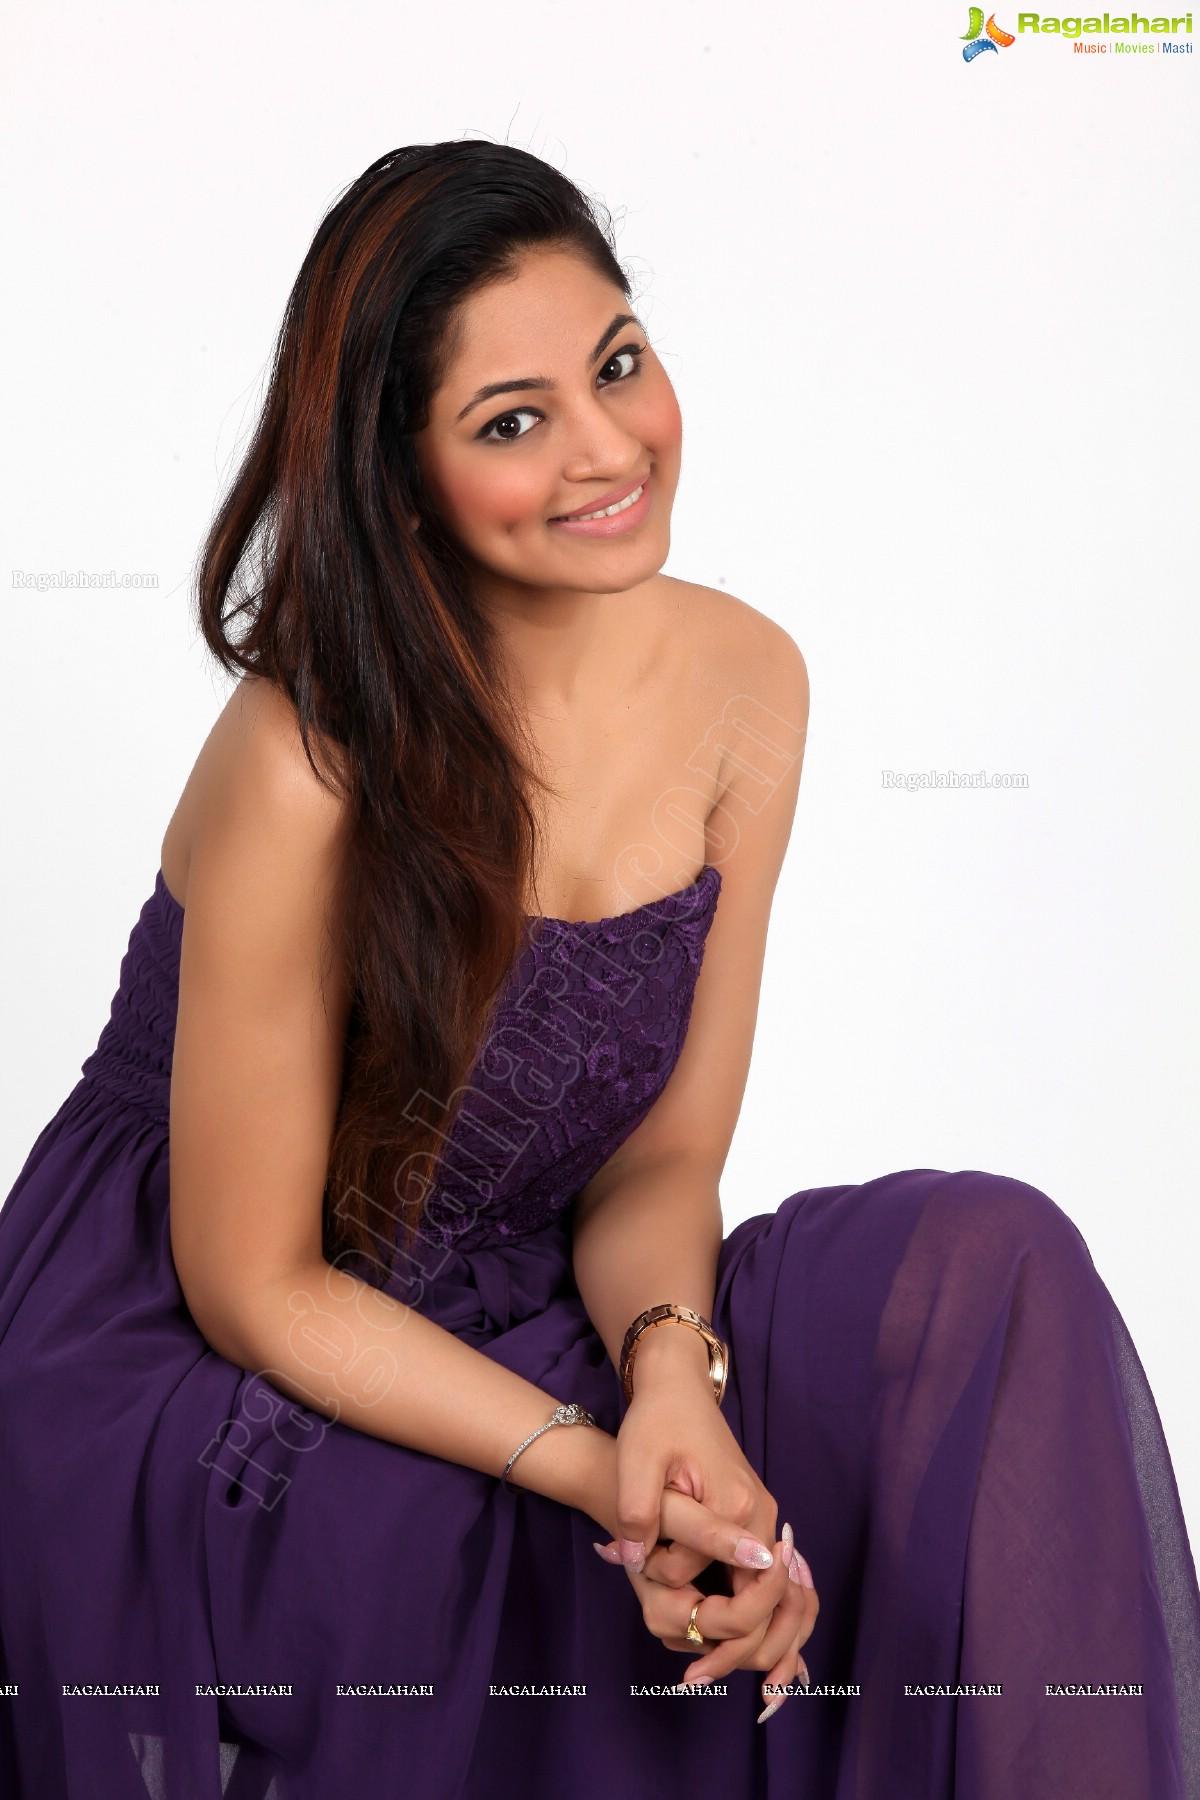 Shilpi Sharma (Exclusive)